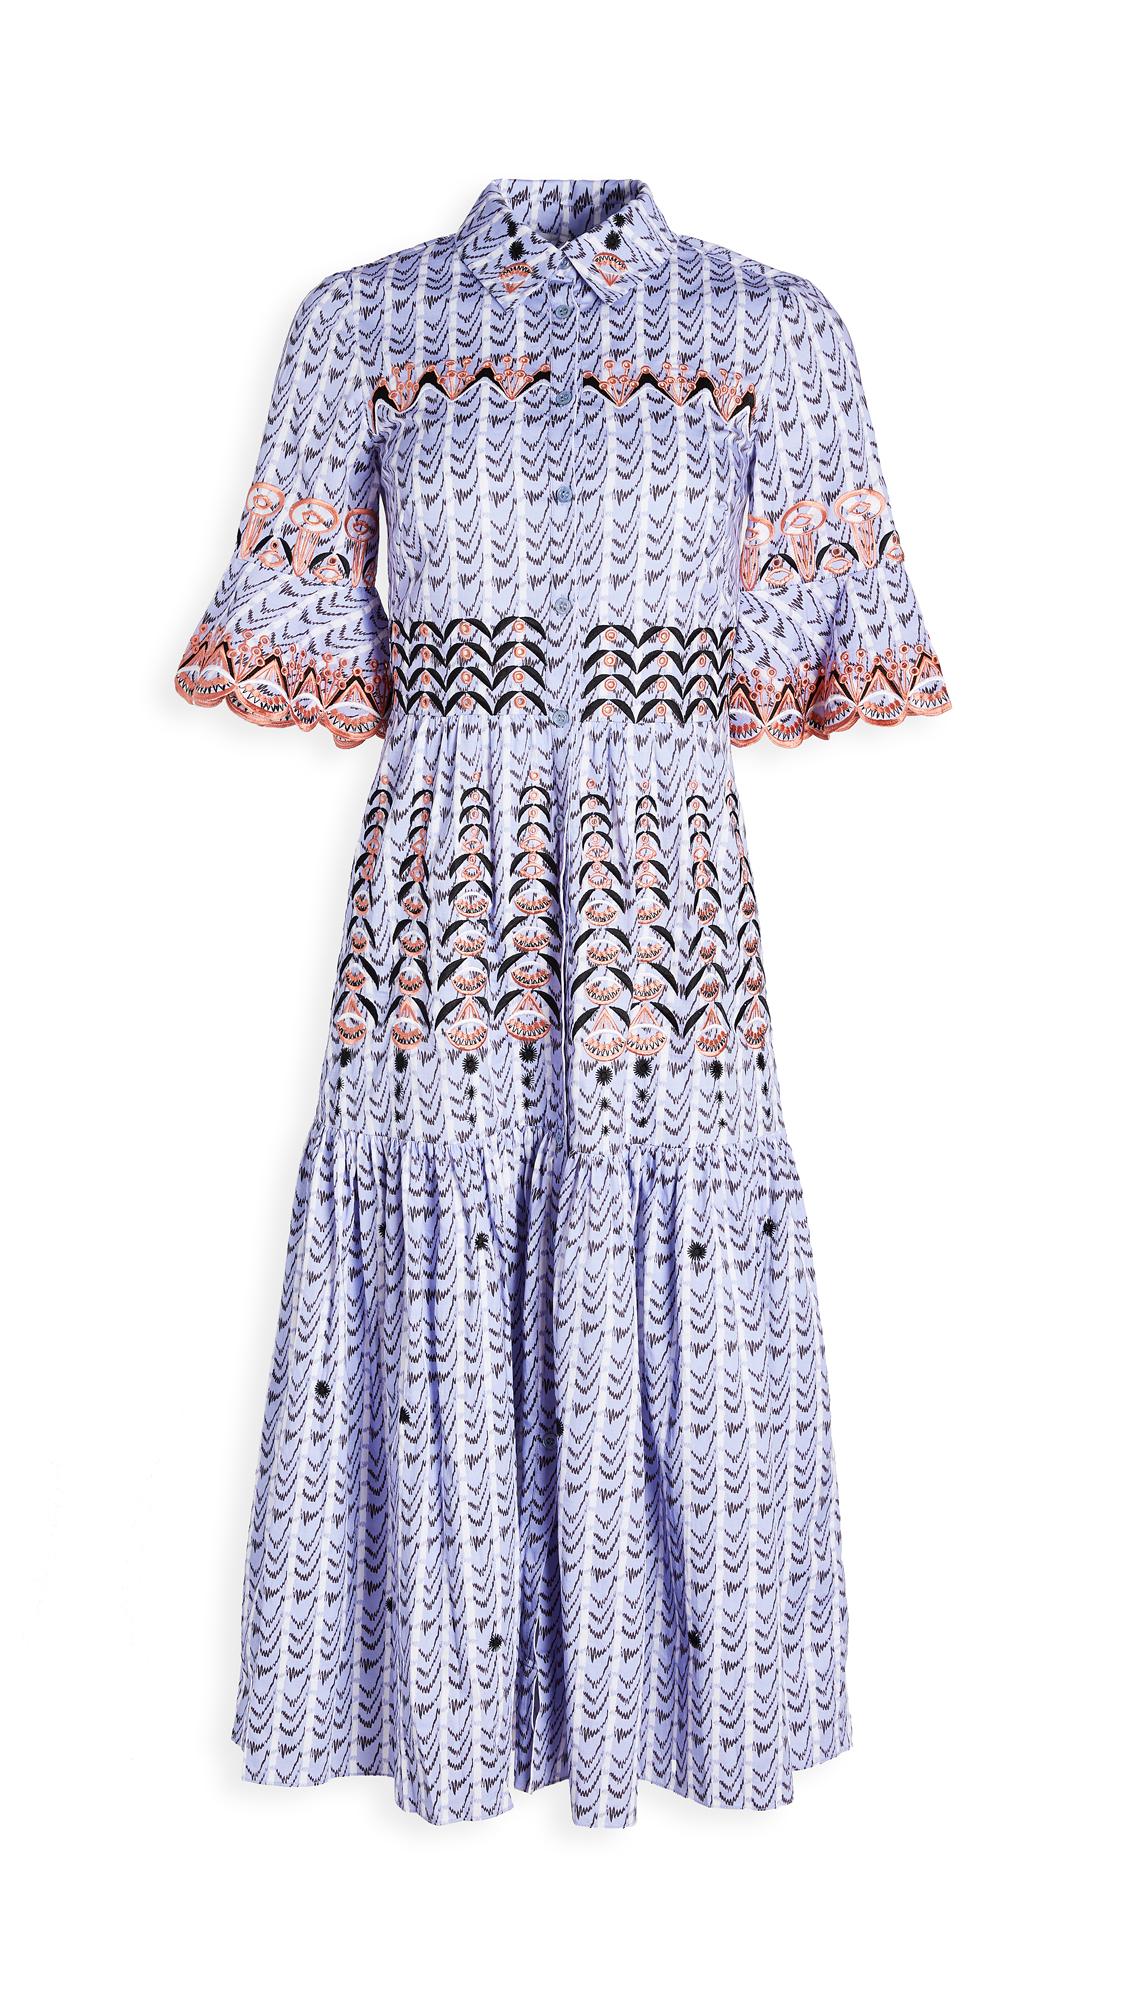 Photo of Temperley London Poet Dress - shop Temperley London Clothing, Dresses online